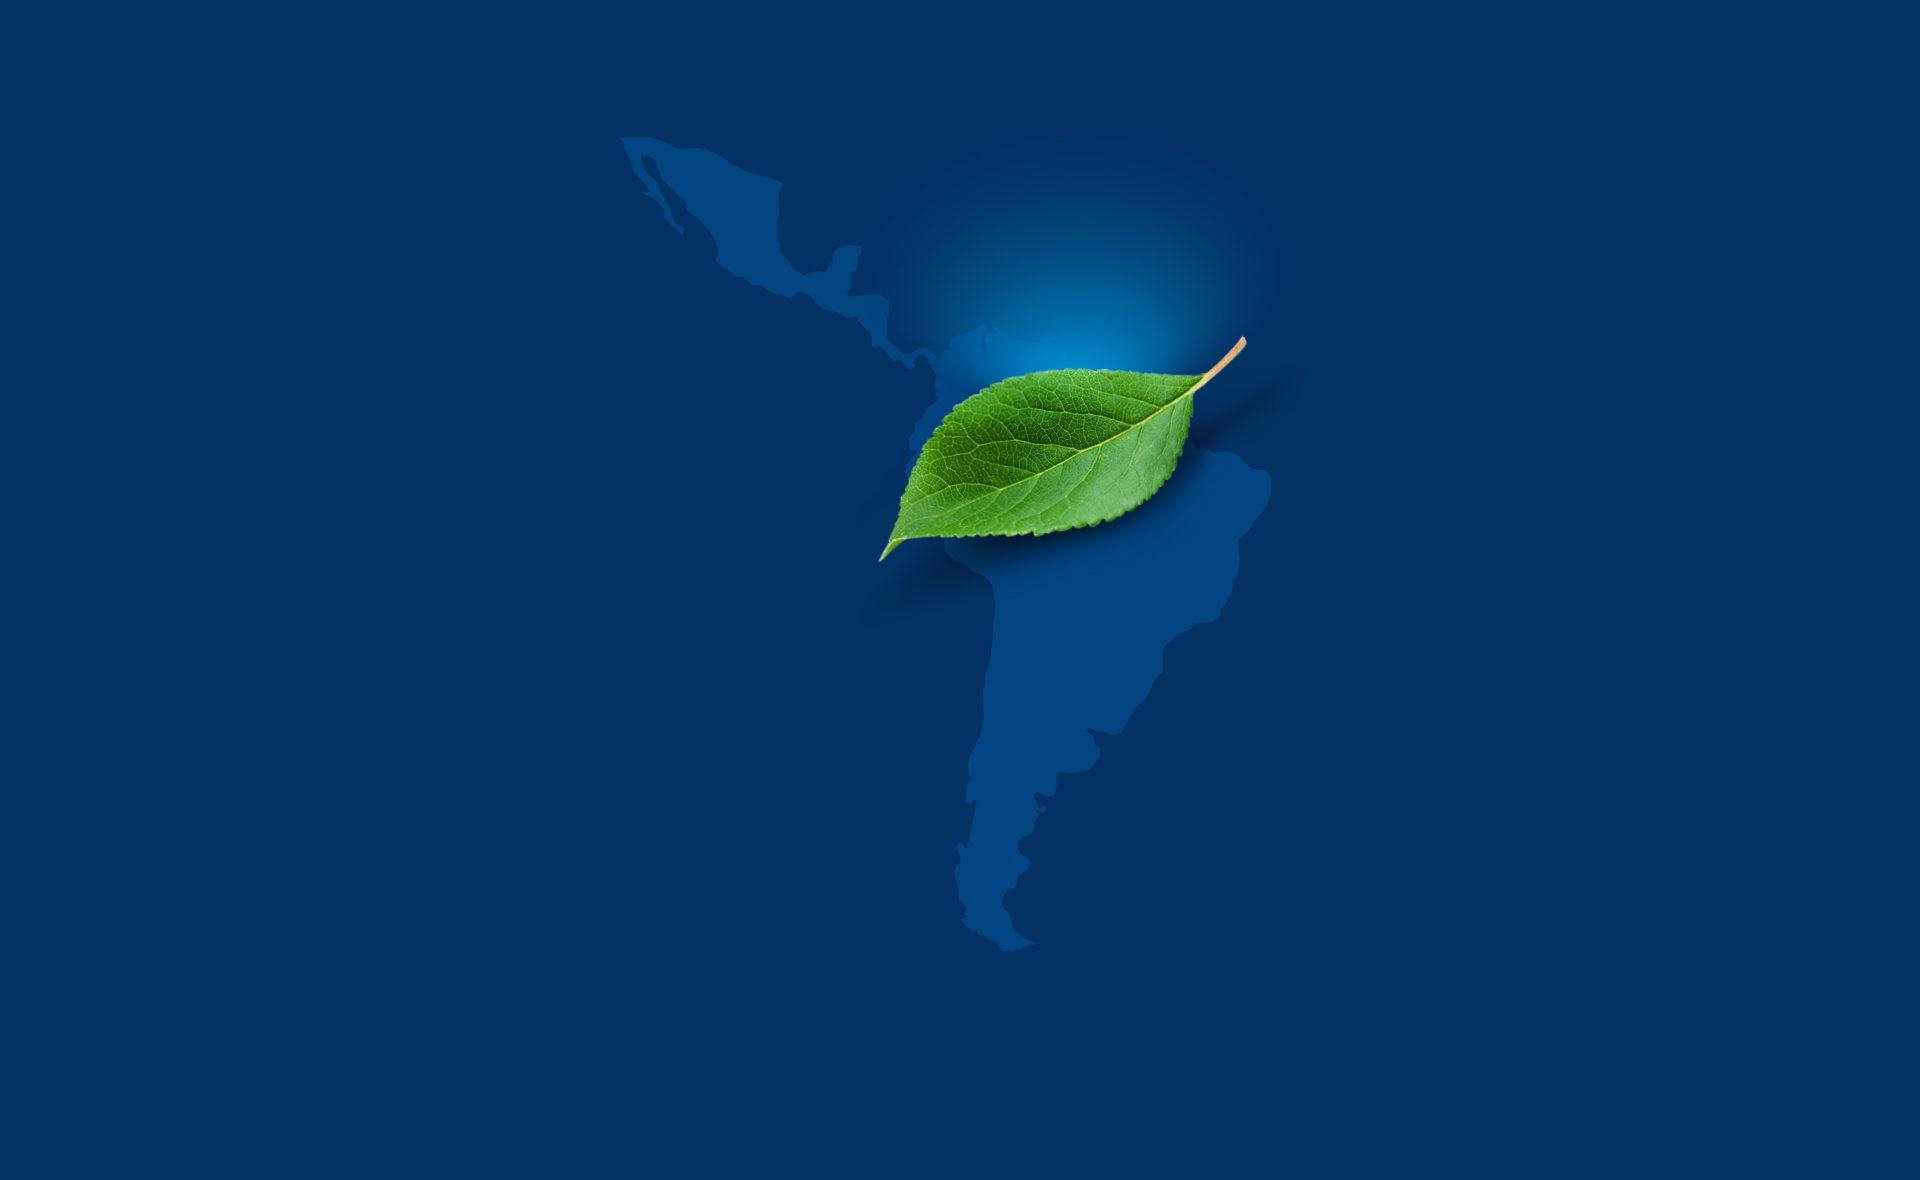 sostenibilidad_iberoamerica